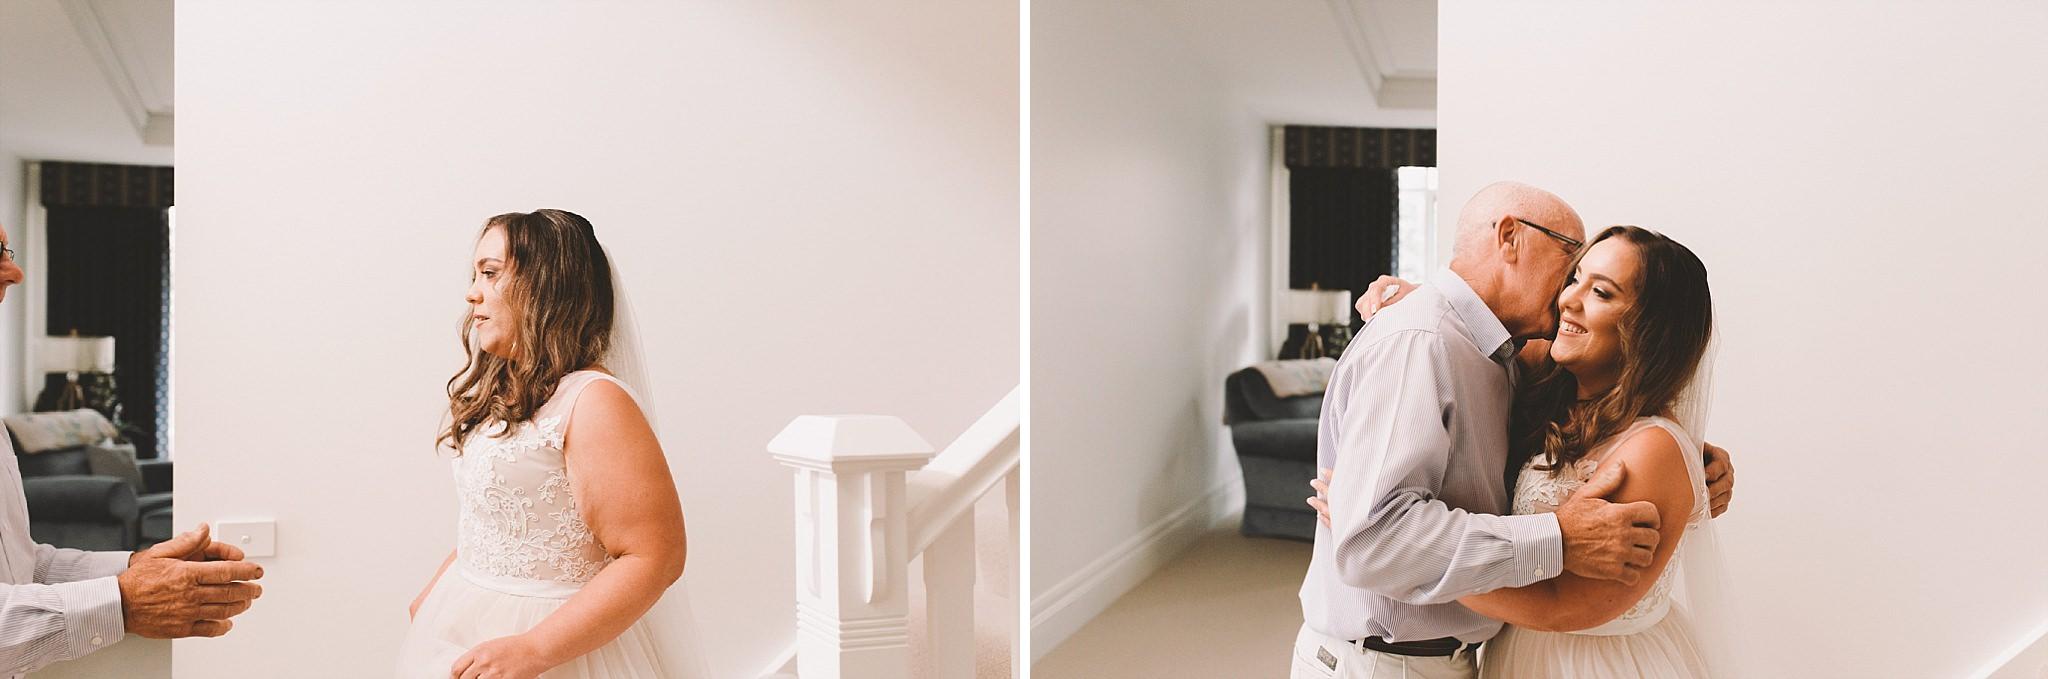 Mornington Peninsula Wedding Photographer 50.JPG